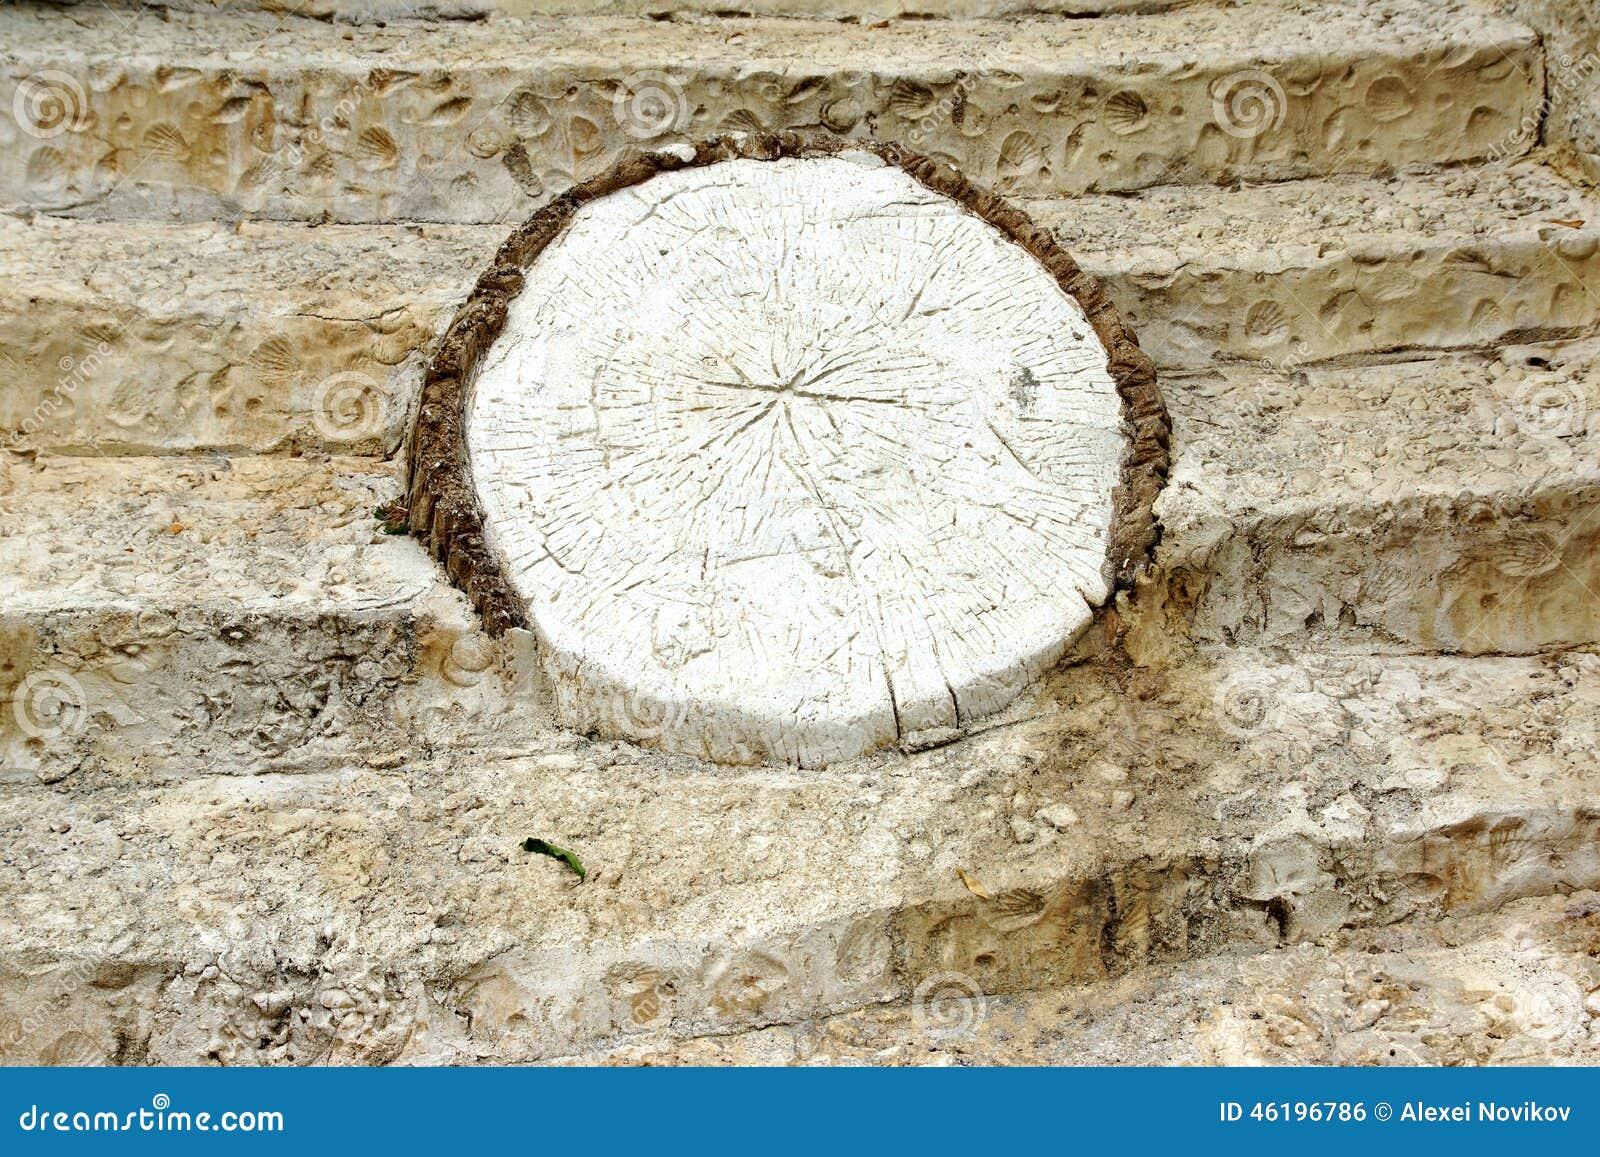 White Decorative Stones : White concrete decorative stone like as tree cross section